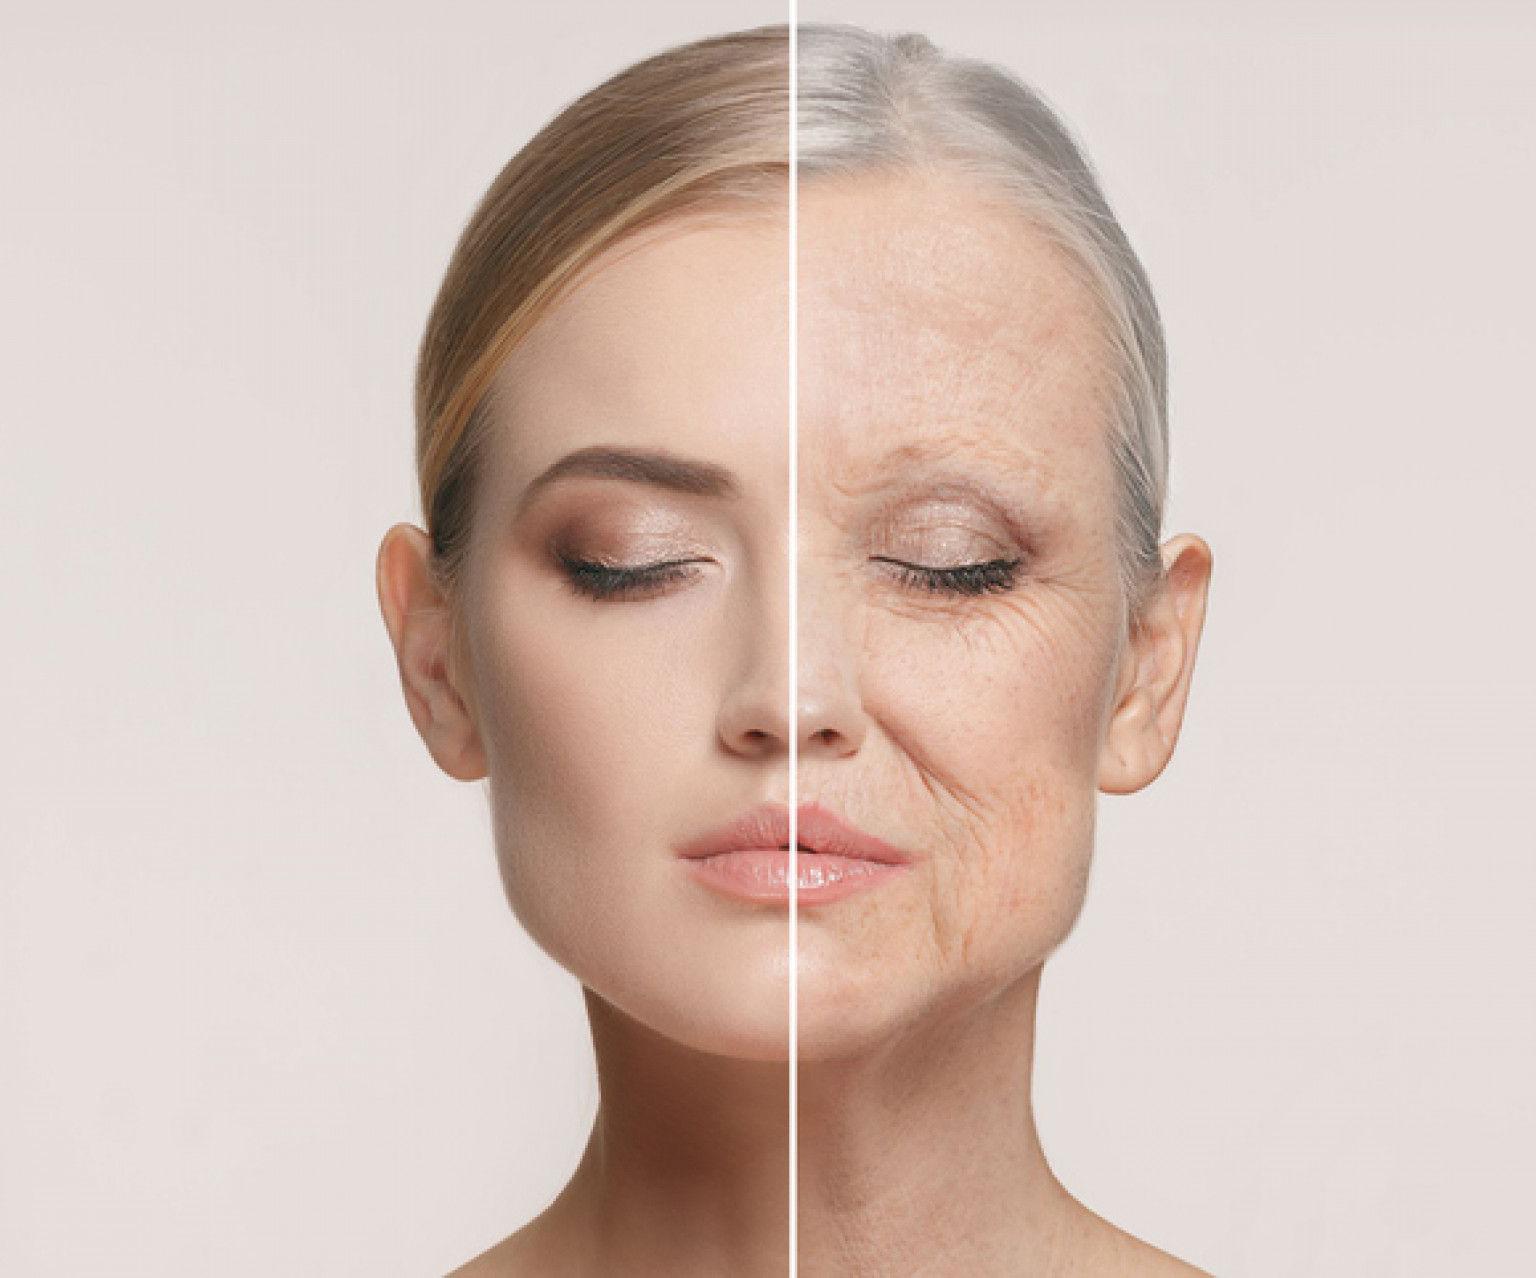 Inestetismi della pelle – i segreti per ringiovanirla e prendersene cura.